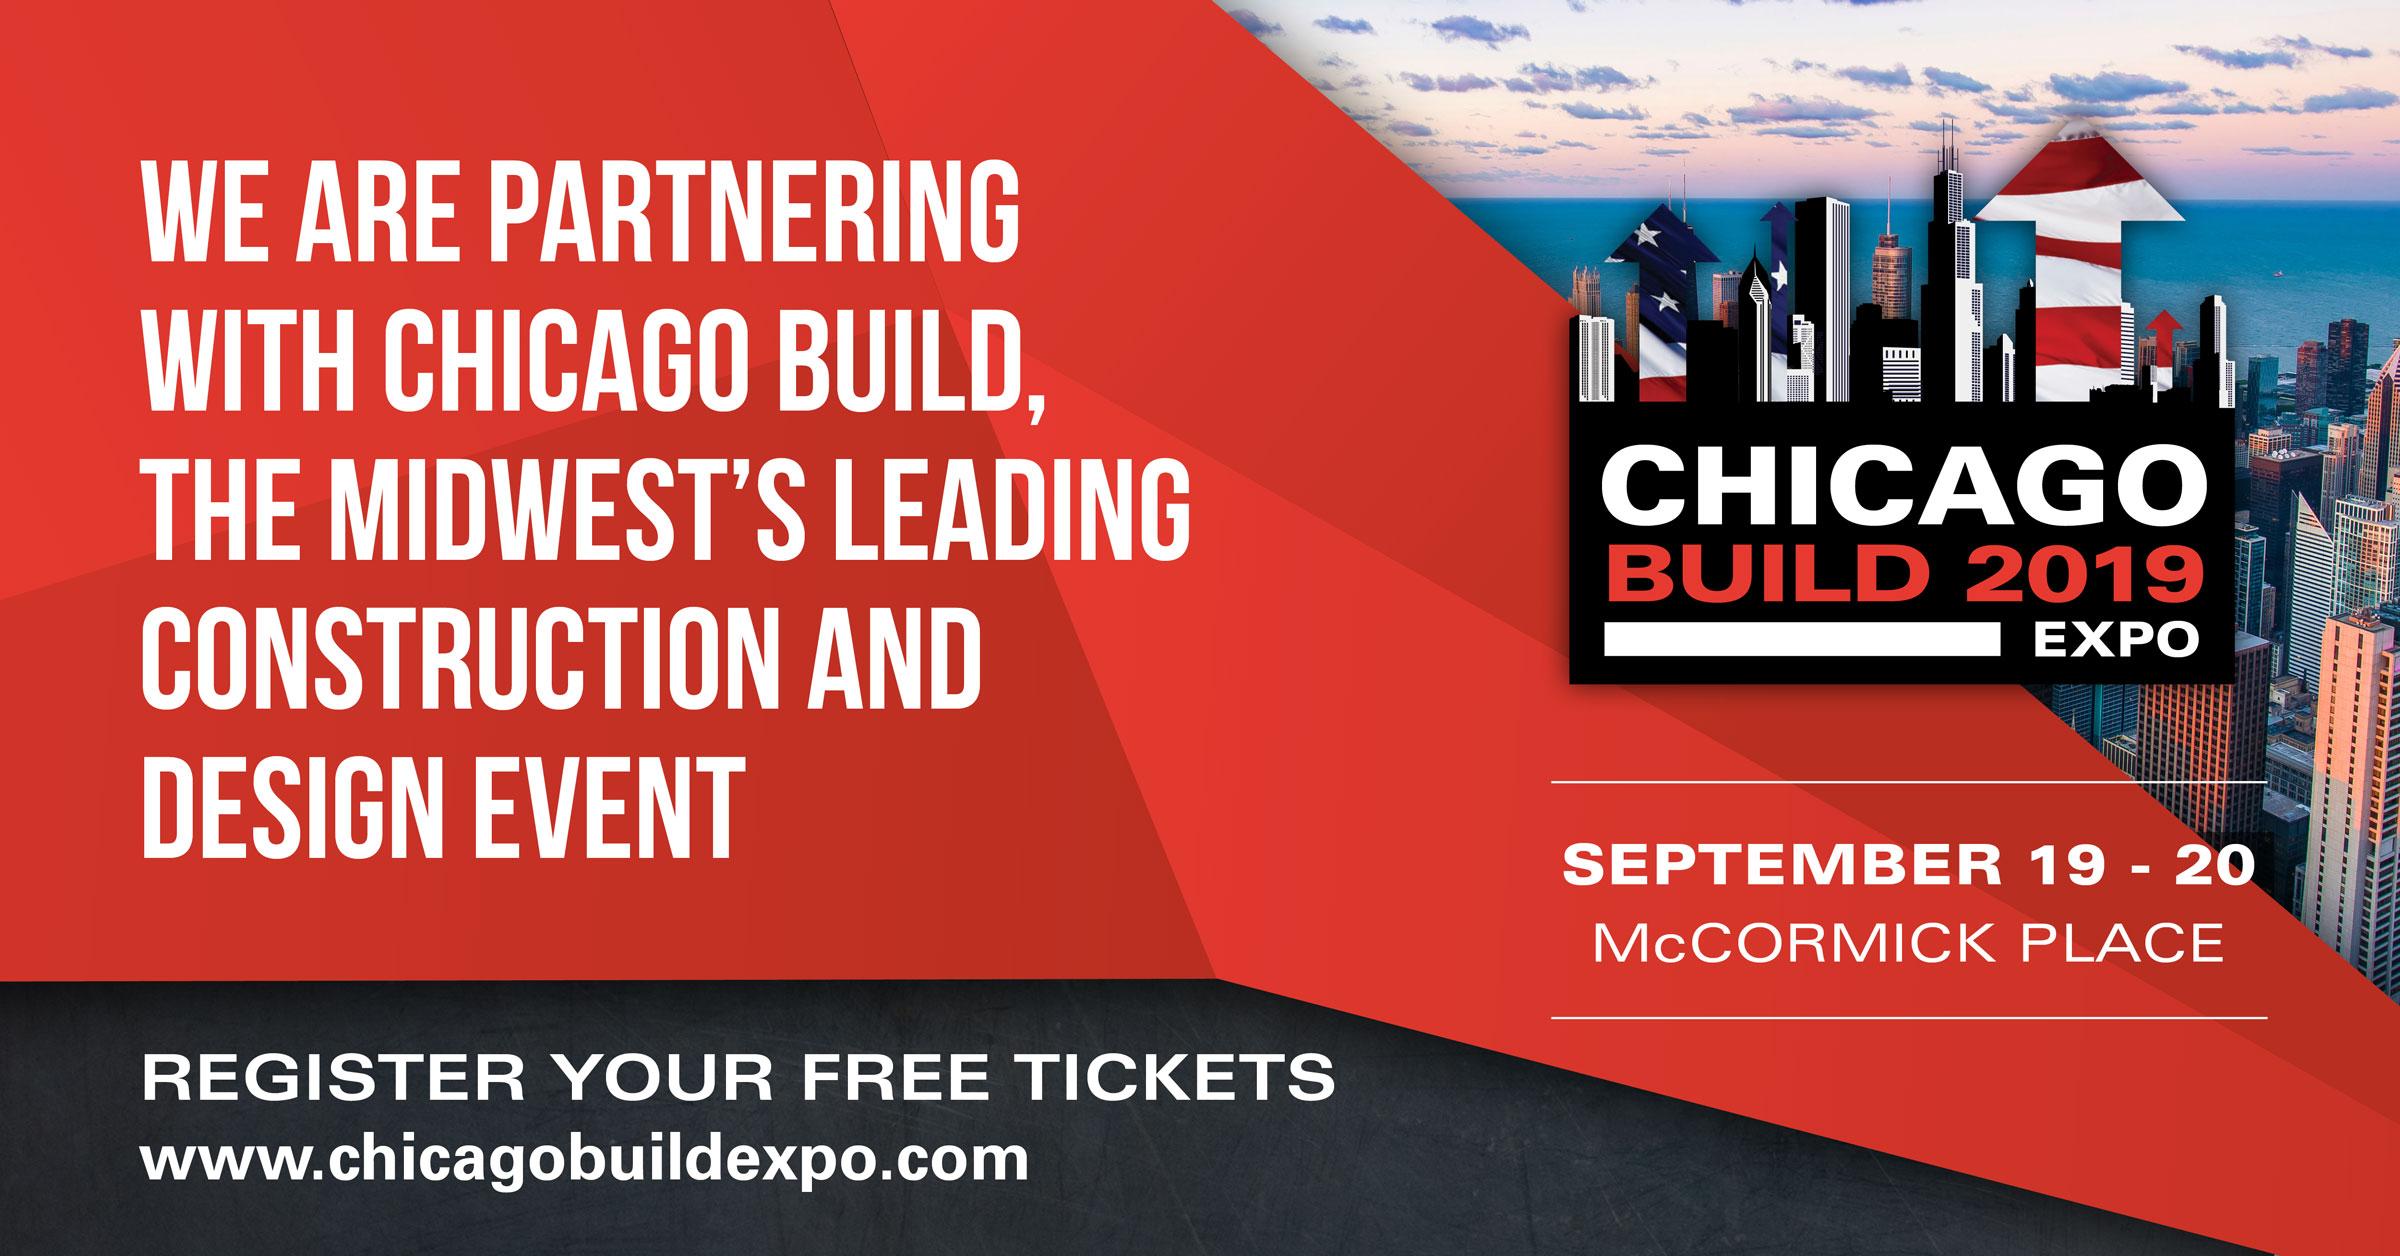 Chicago build 2019 partner